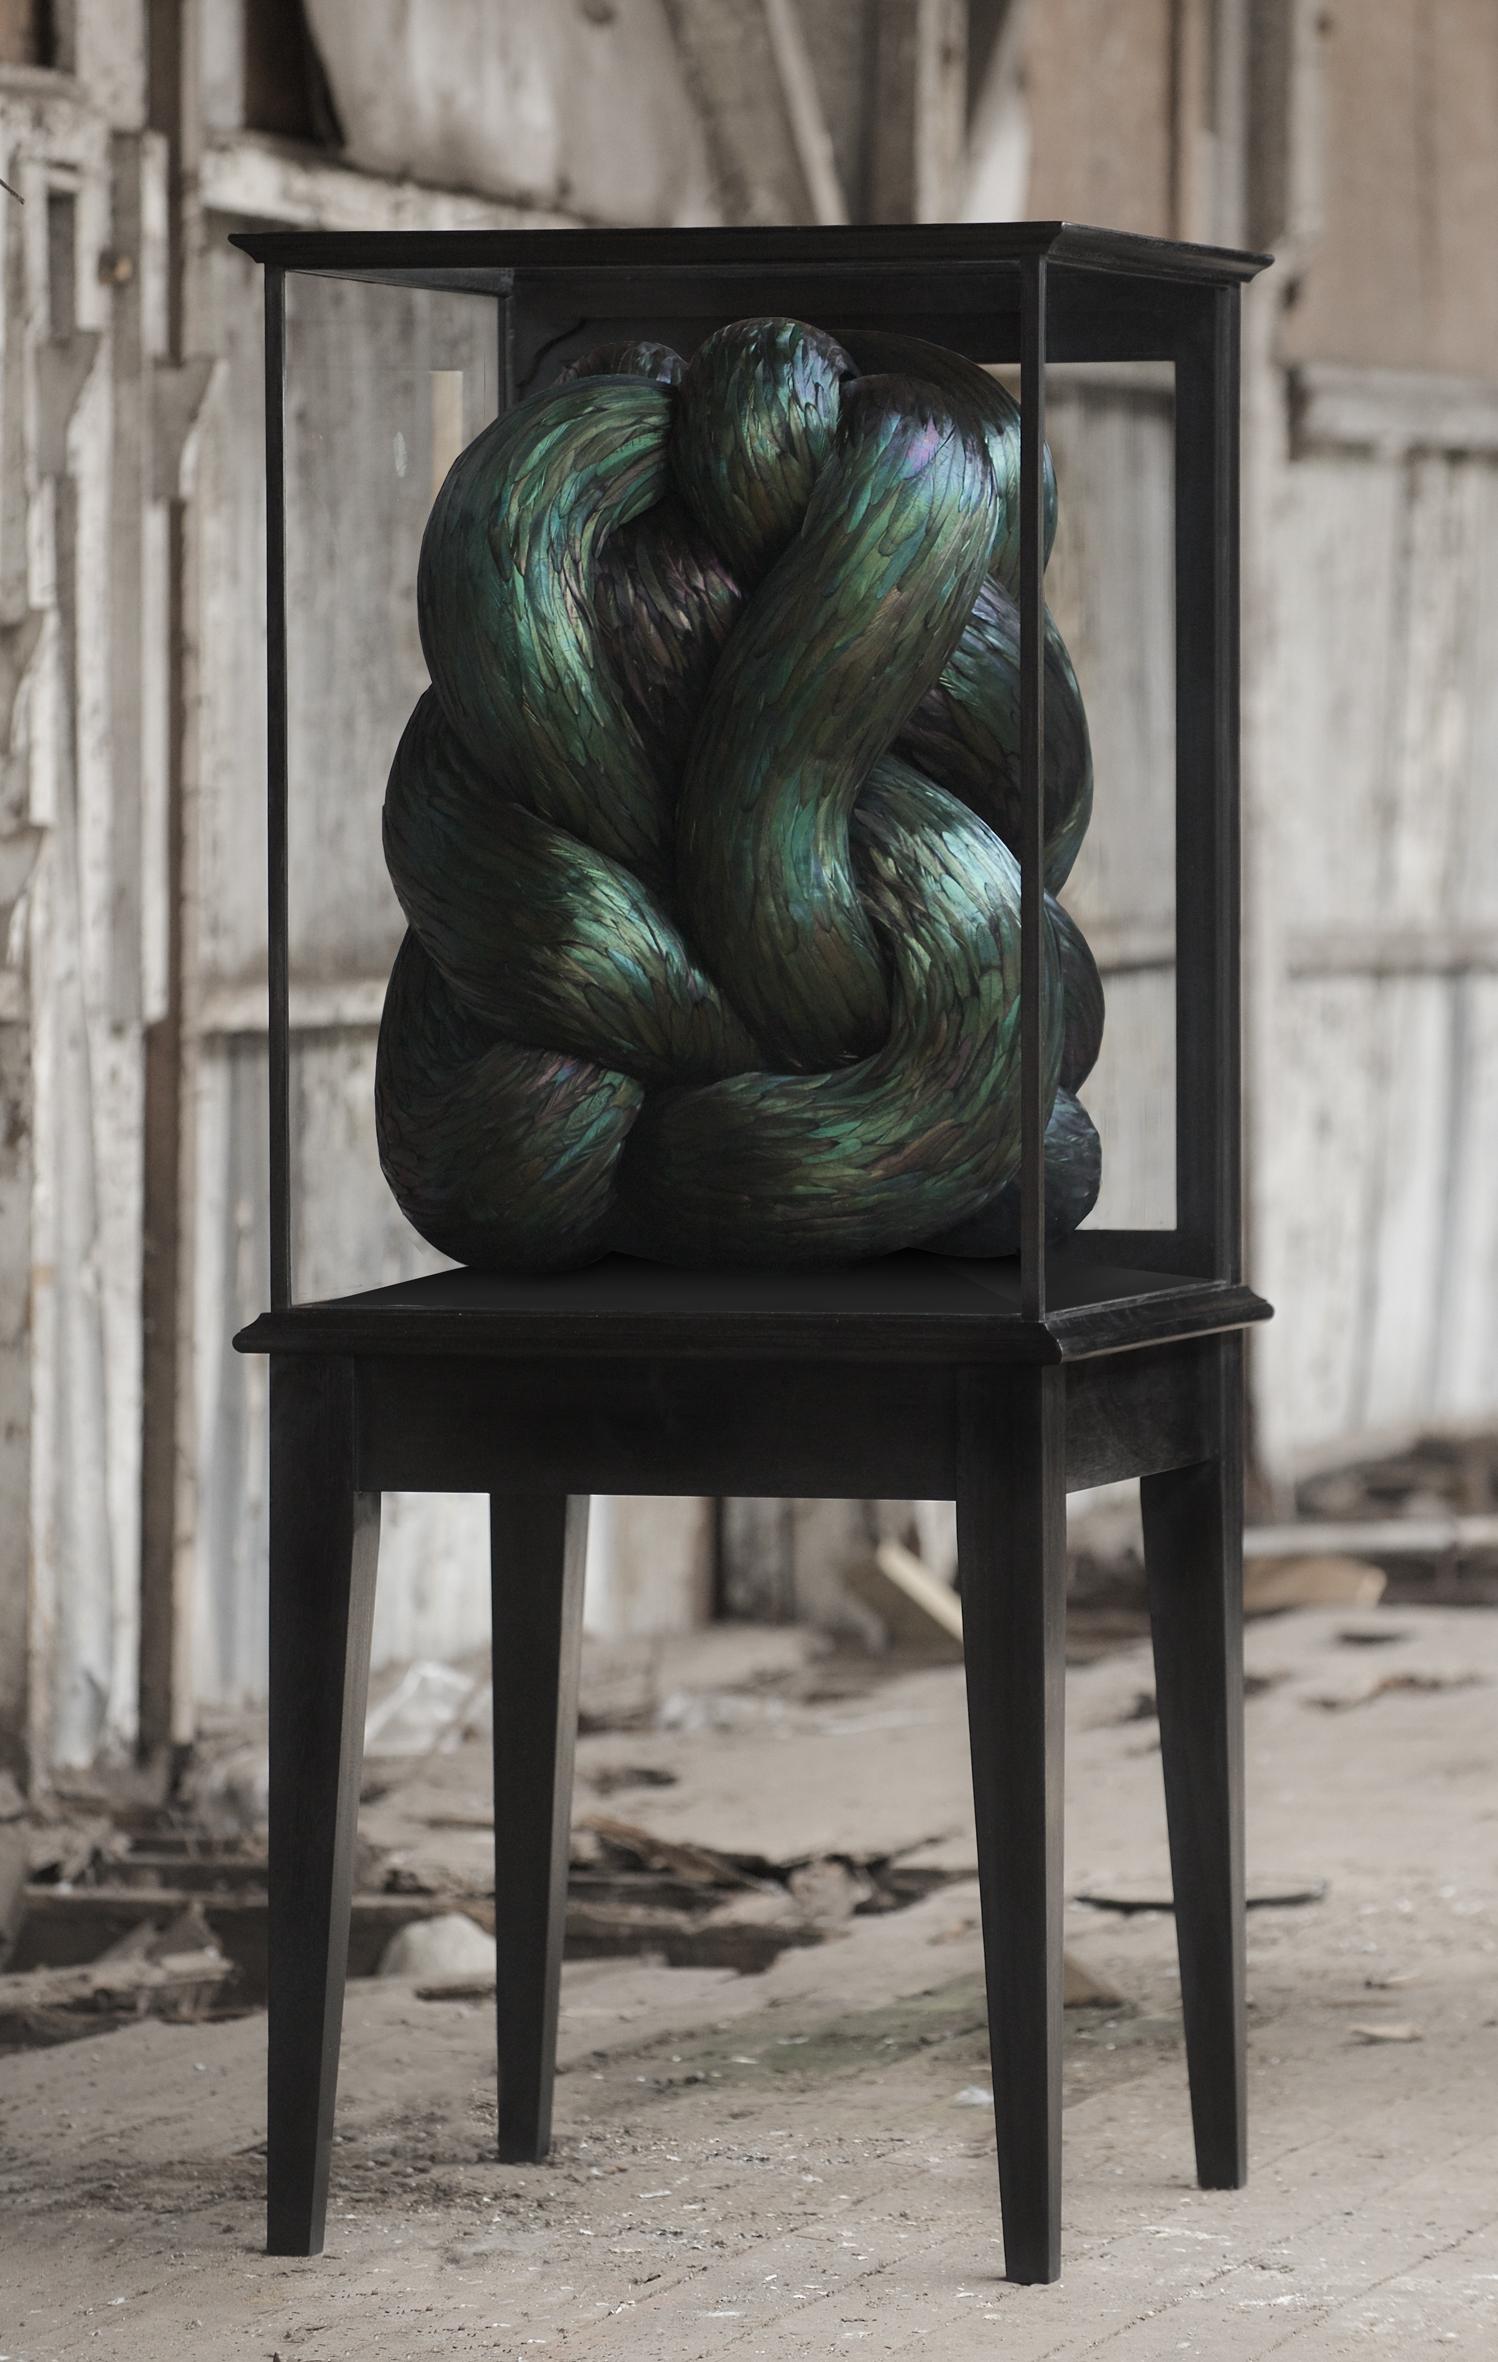 Convolous, 2015, Kate MccGwire - Photo JP Bland